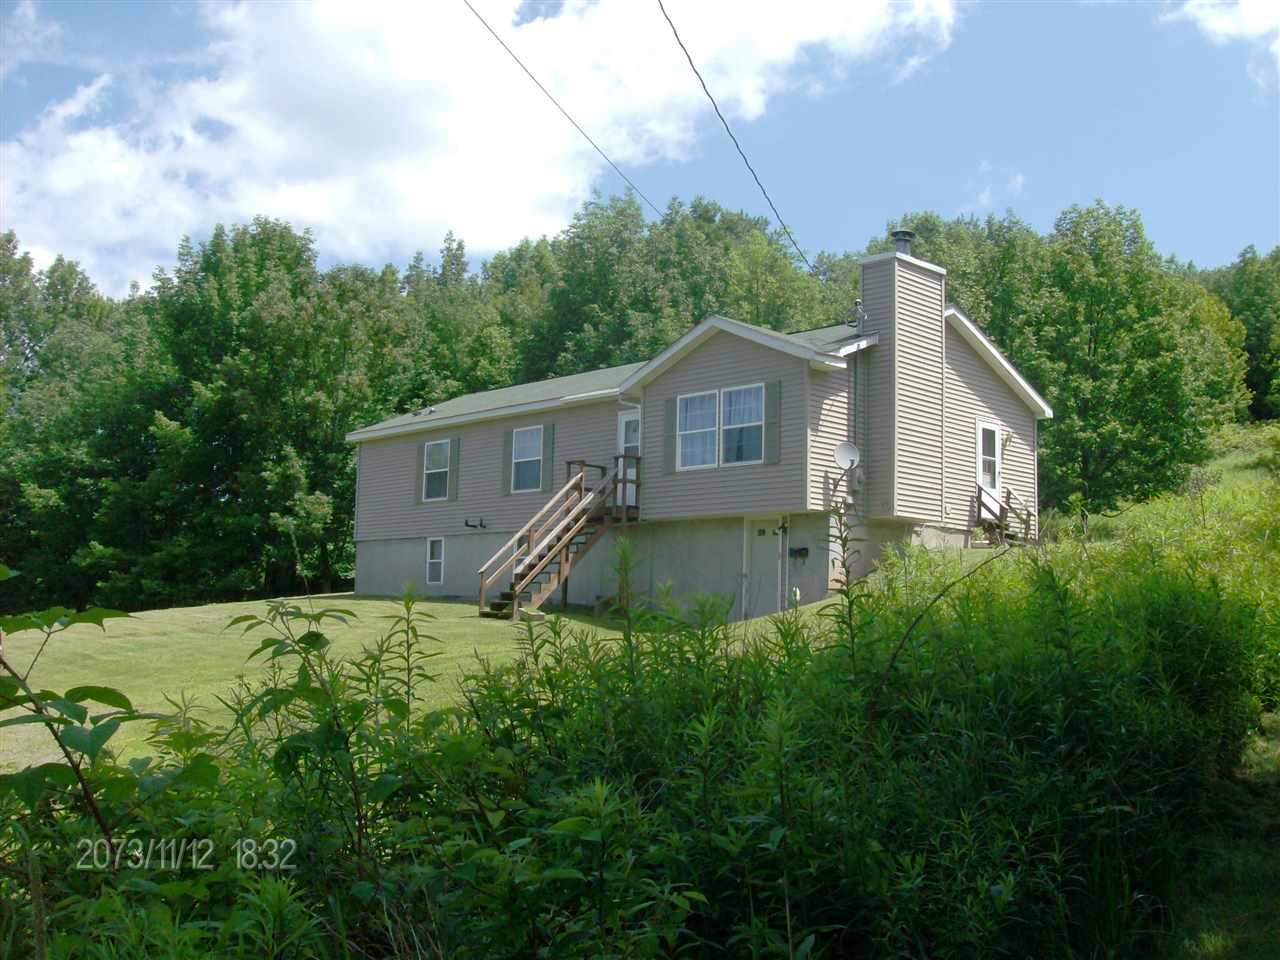 Real Estate for Sale, ListingId: 32971475, Jeffersonville,NY12748